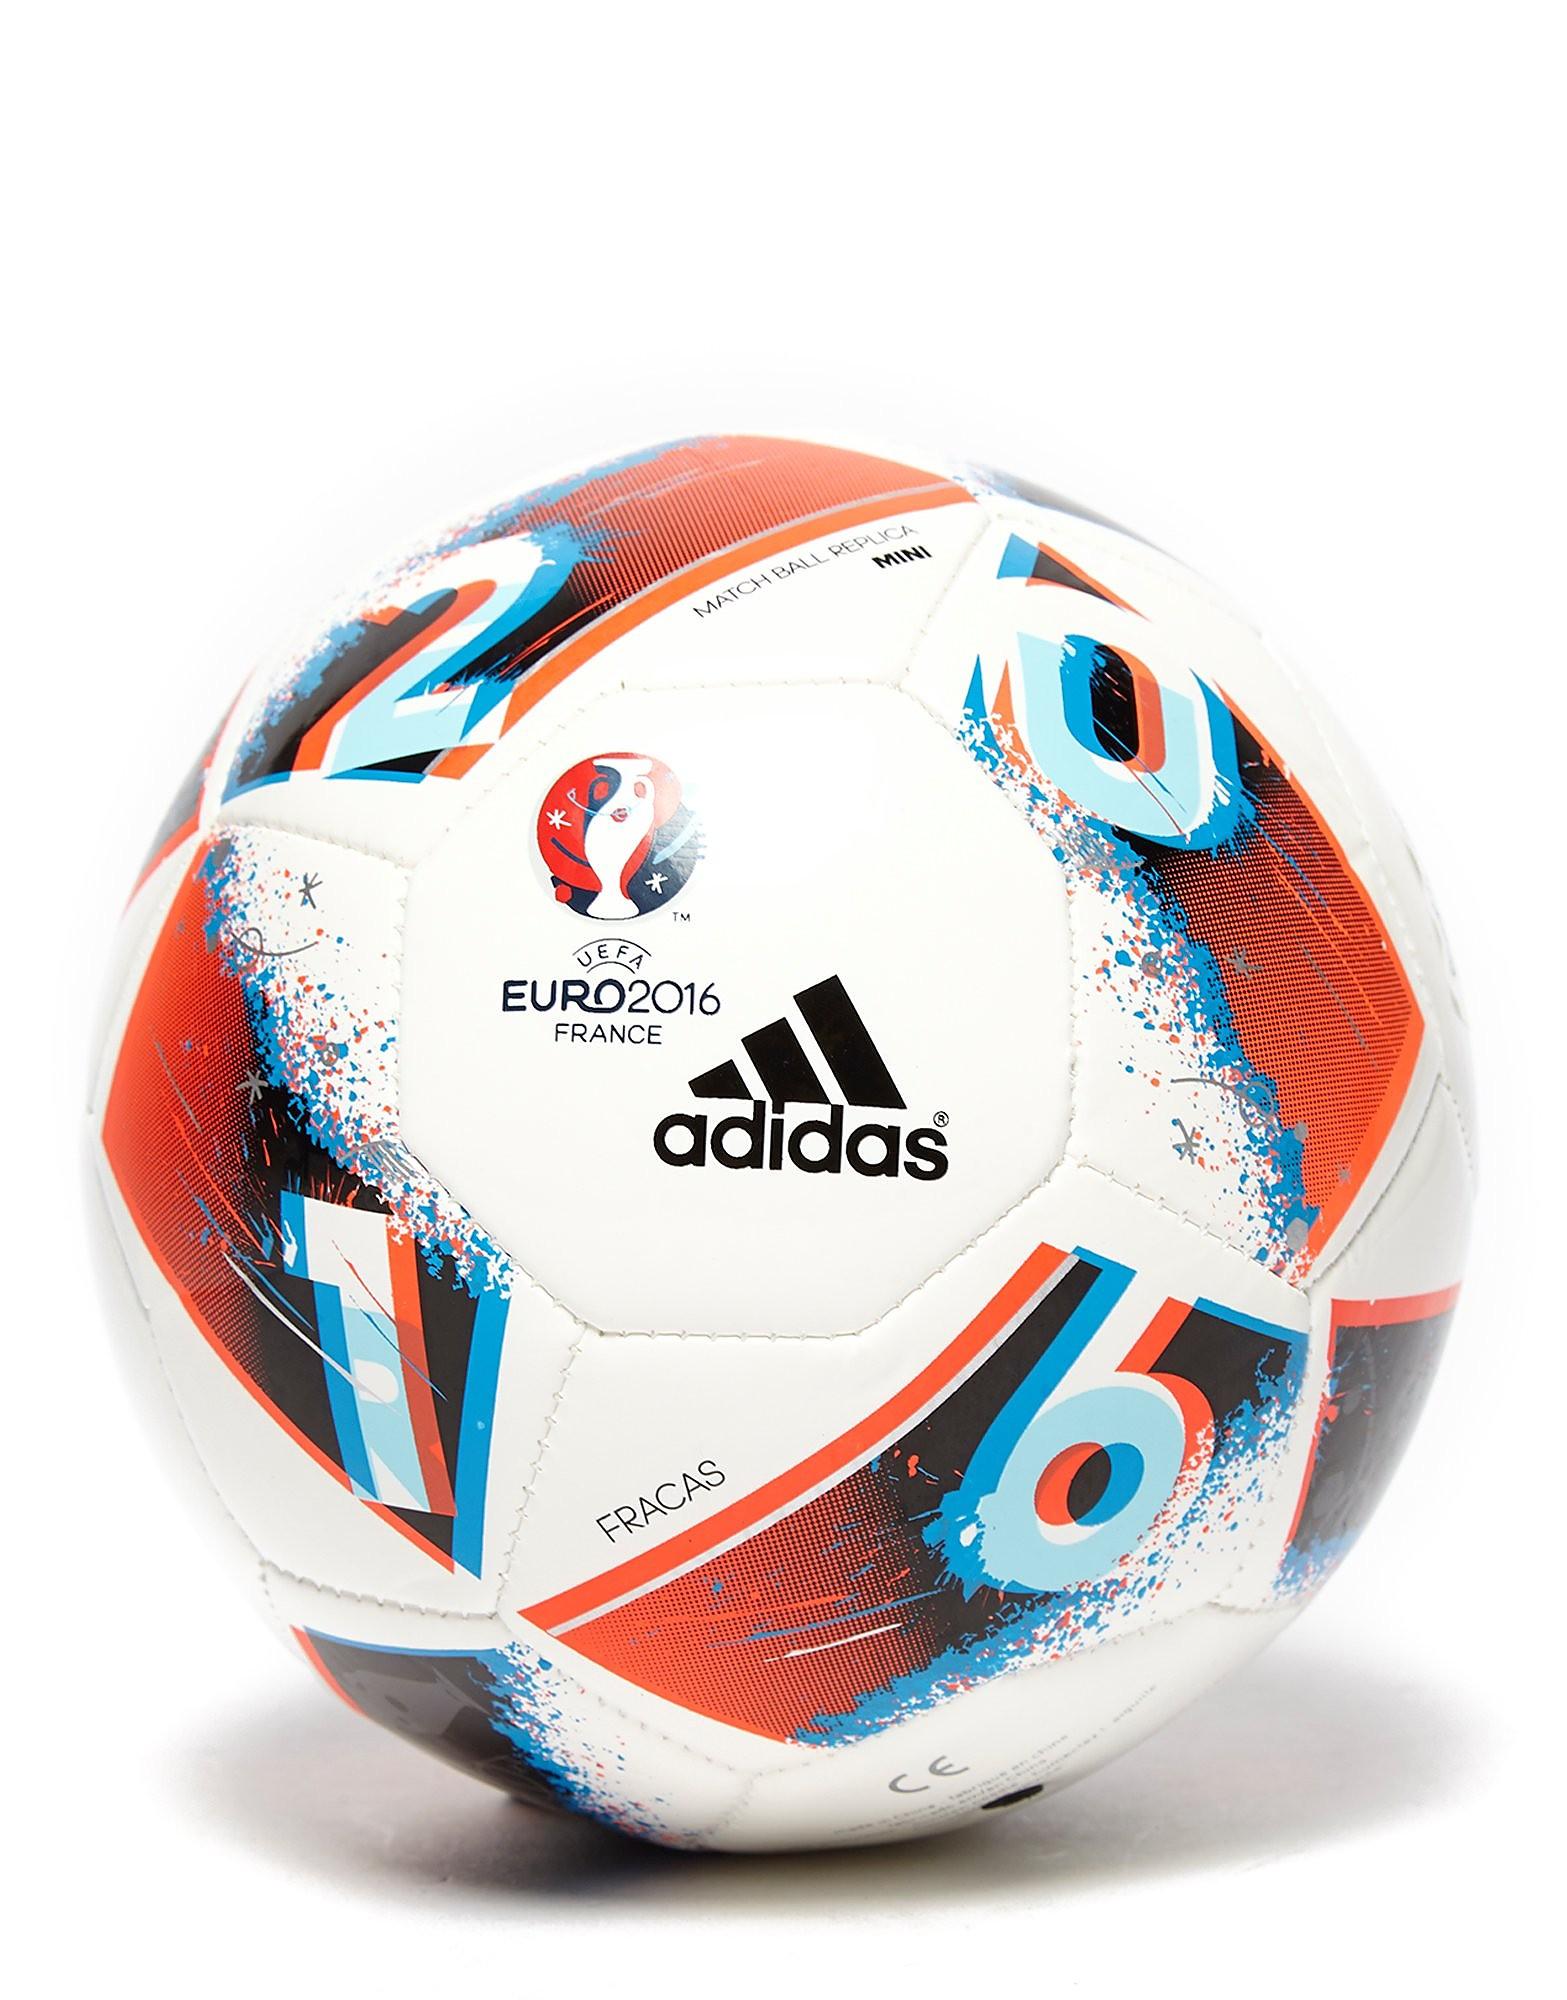 adidas Euro 2016 Final Mini Football